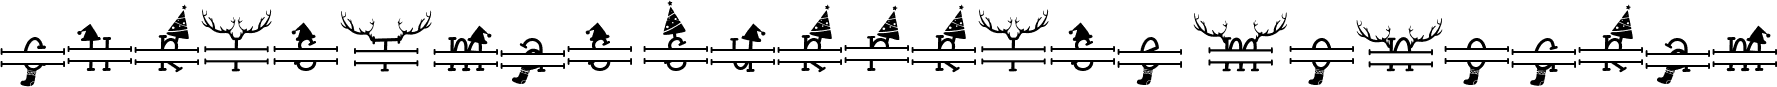 Christmas Surprise Monogram